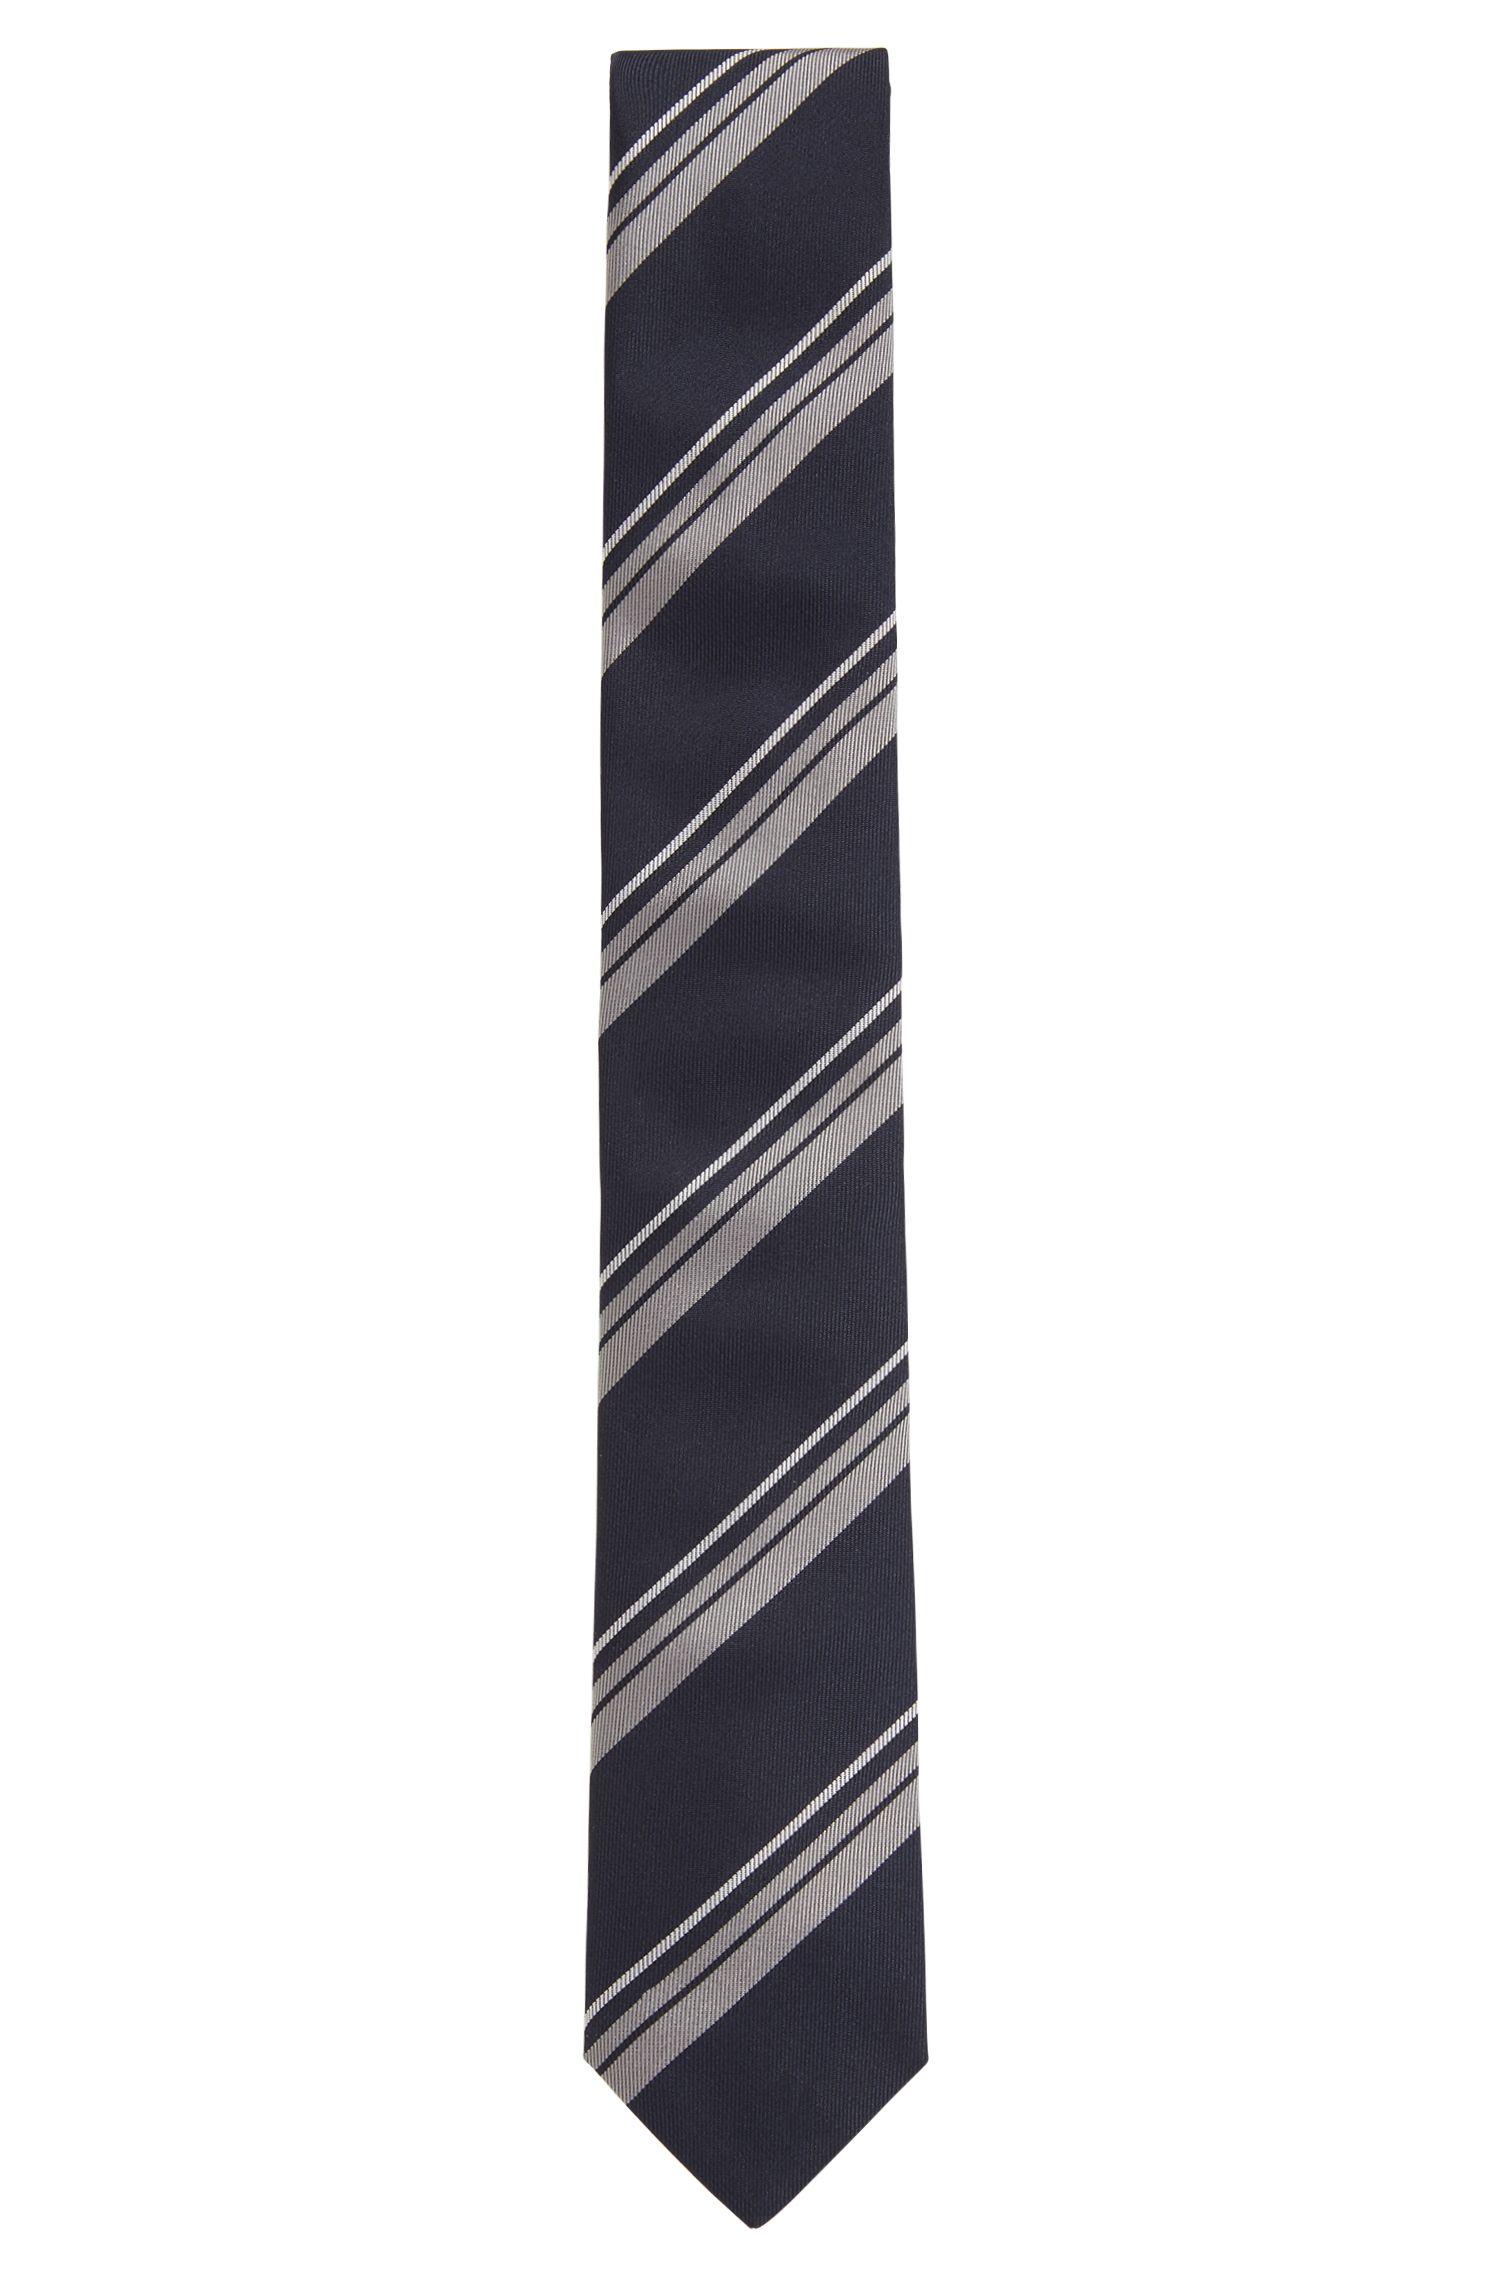 Corbata hecha a mano con rayas diagonales en jacquard de seda, Azul